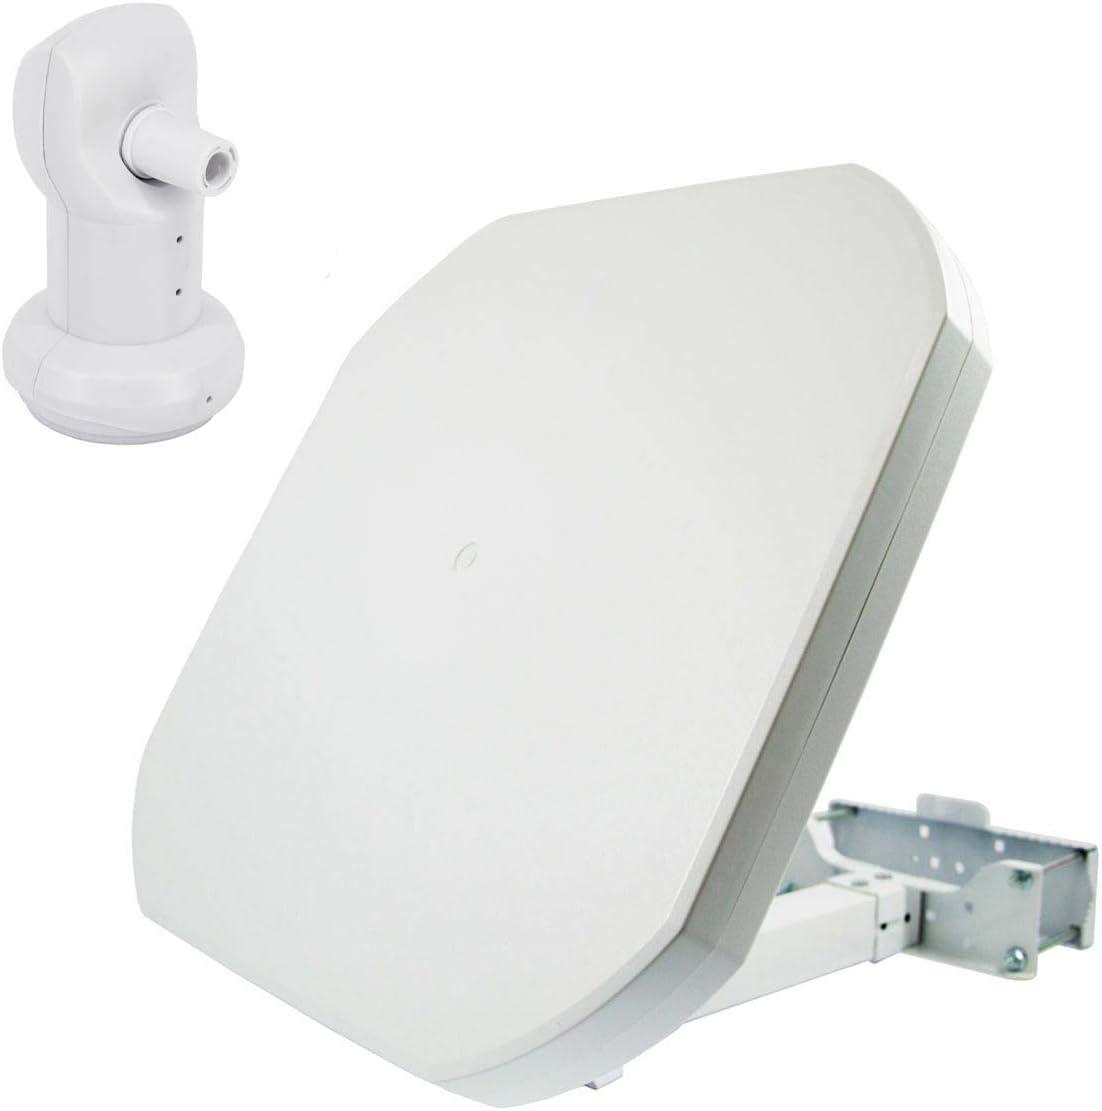 PremiumX FLAT43 Antena plana de satélite con LNB único – Antena de satélite digital para 1 participante, 4K UHD FullHD